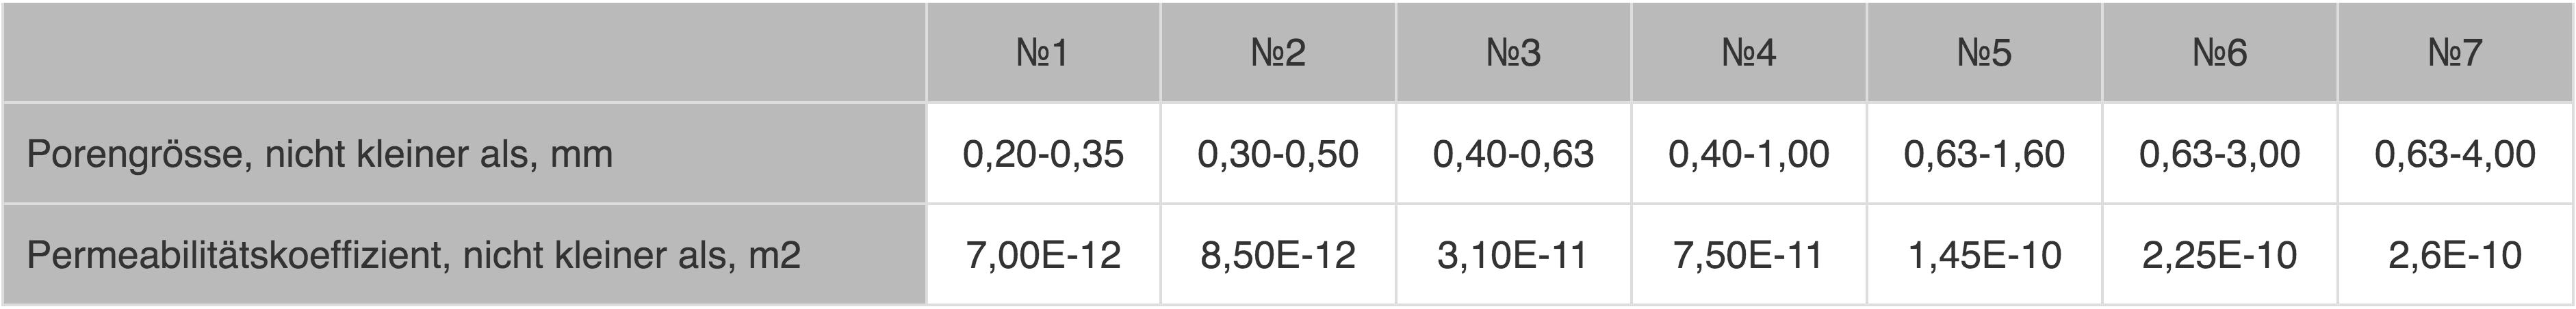 Permeabilitaetskoeffizient-poroeses-Aluminium-mit-unterschiedlichen_Porengroessen